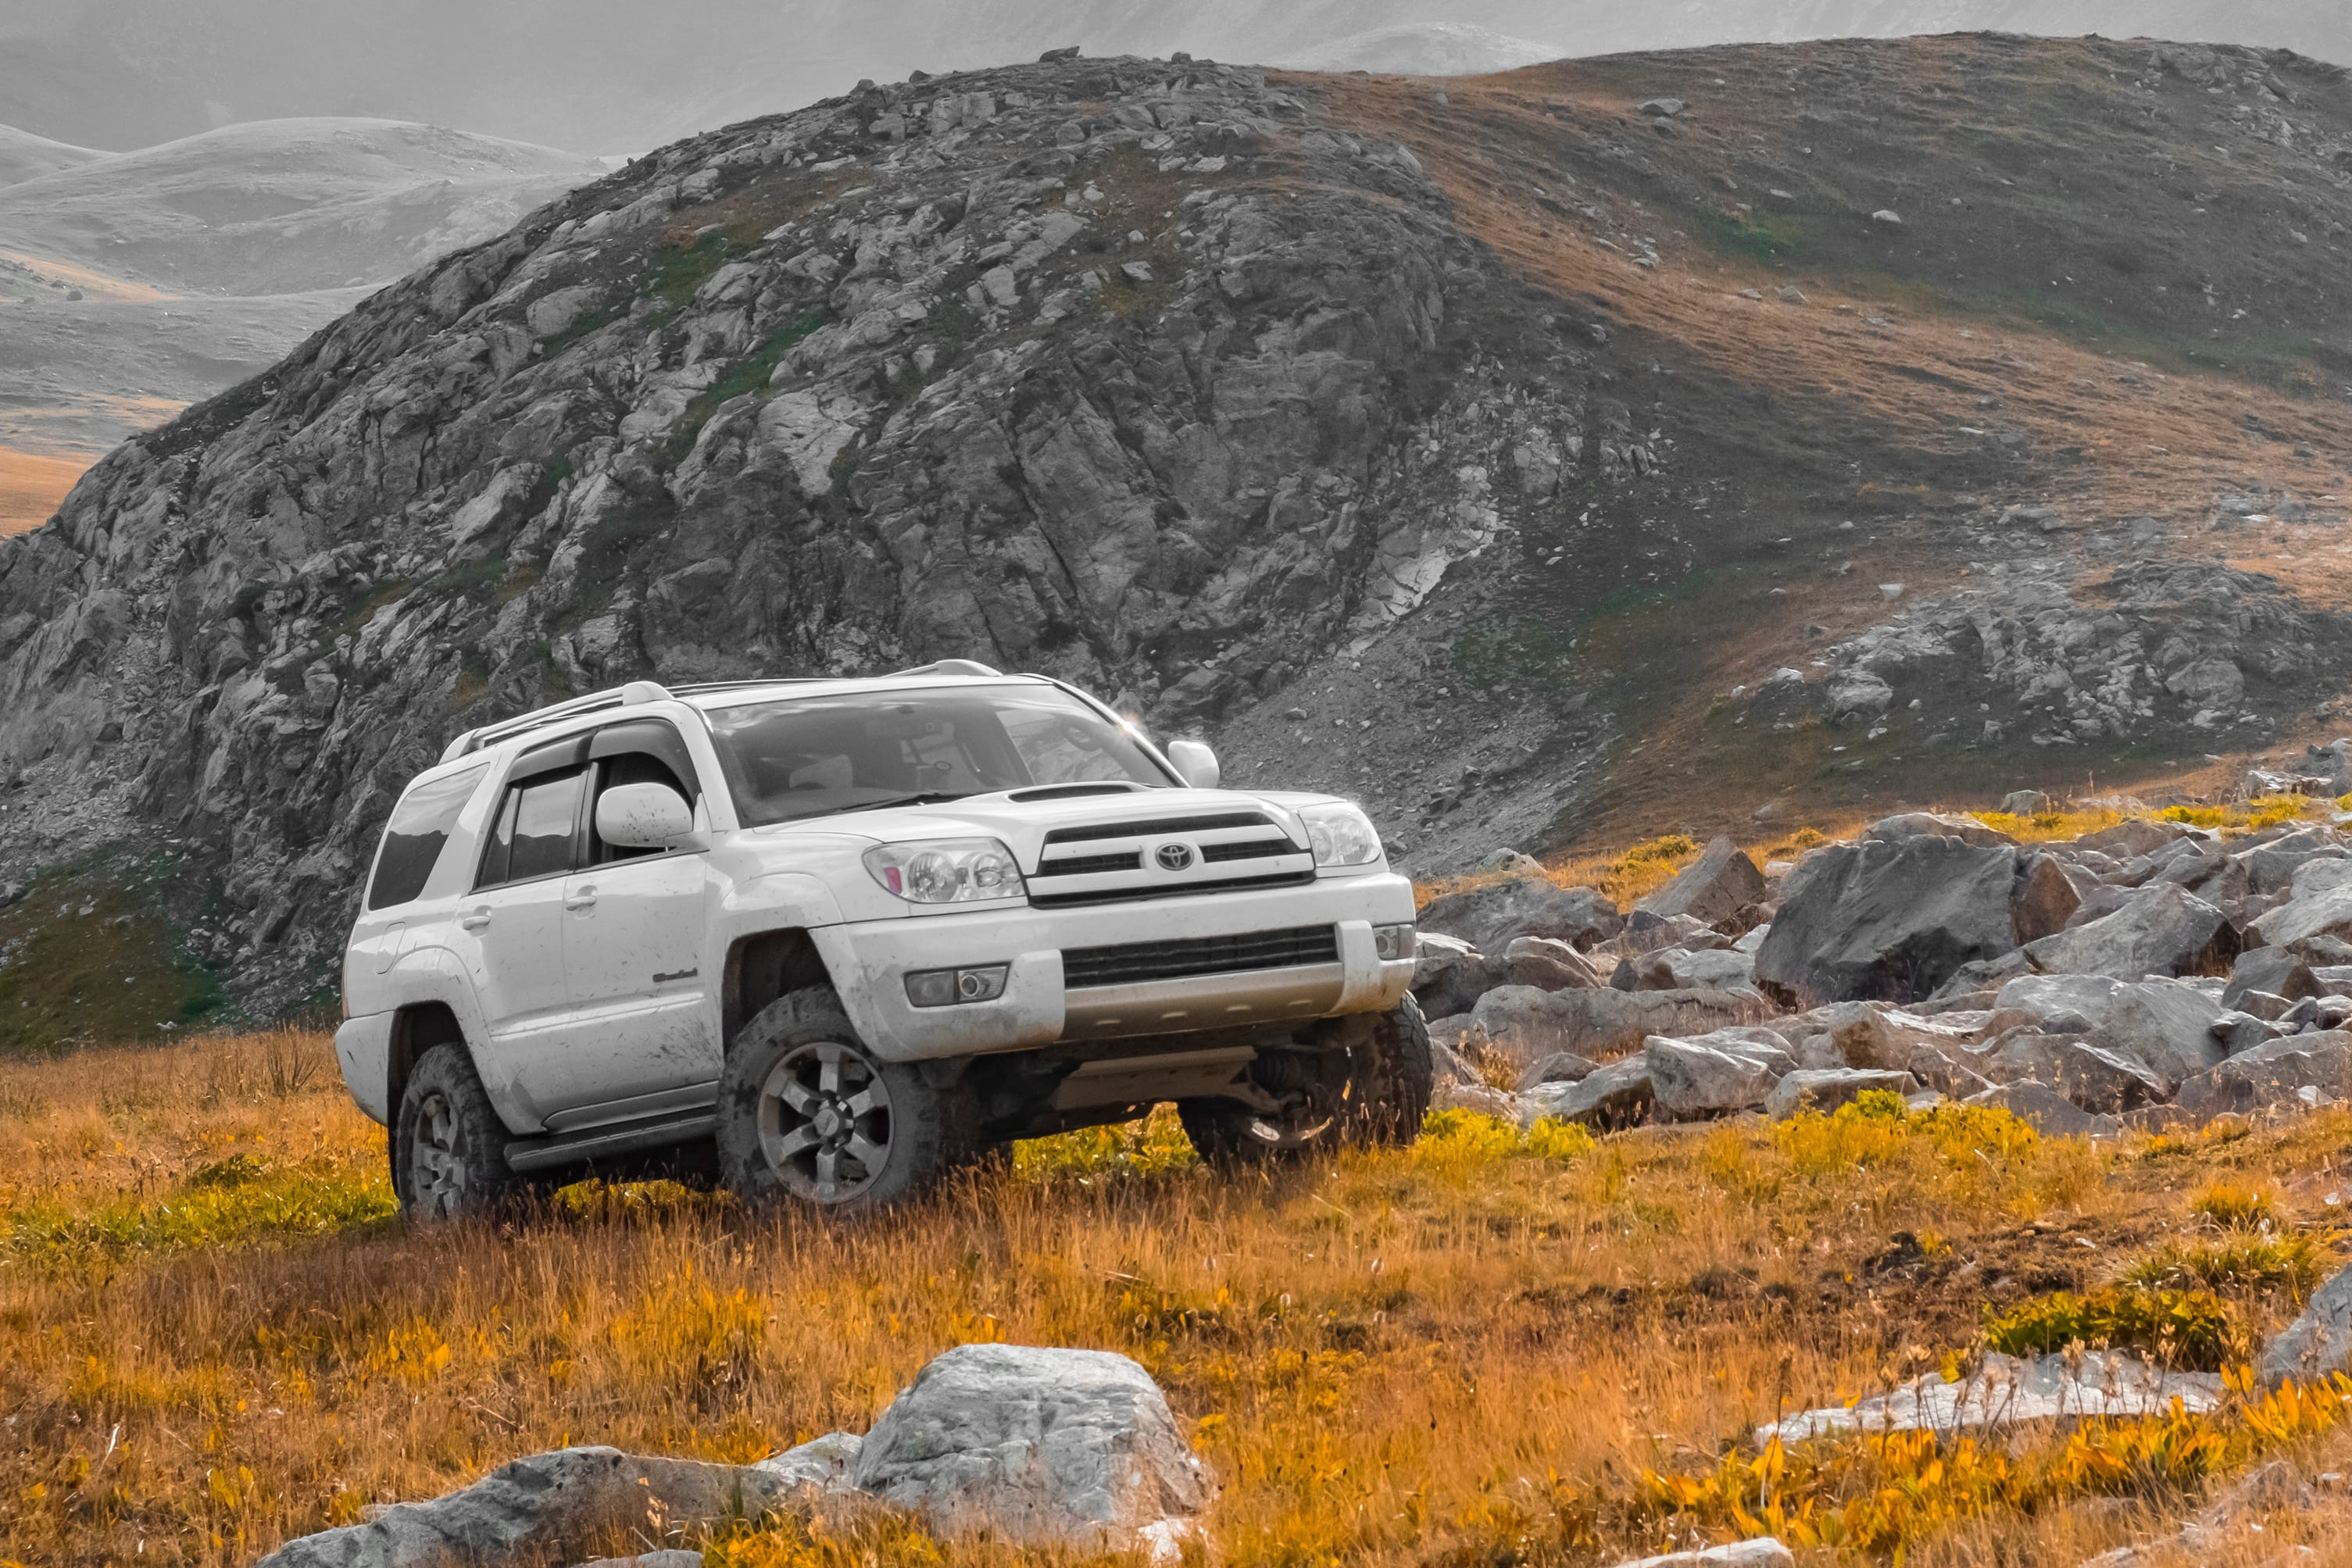 Toyota Adds Nearly 1.3 Million Vehicles to Takata Air Bag Recall